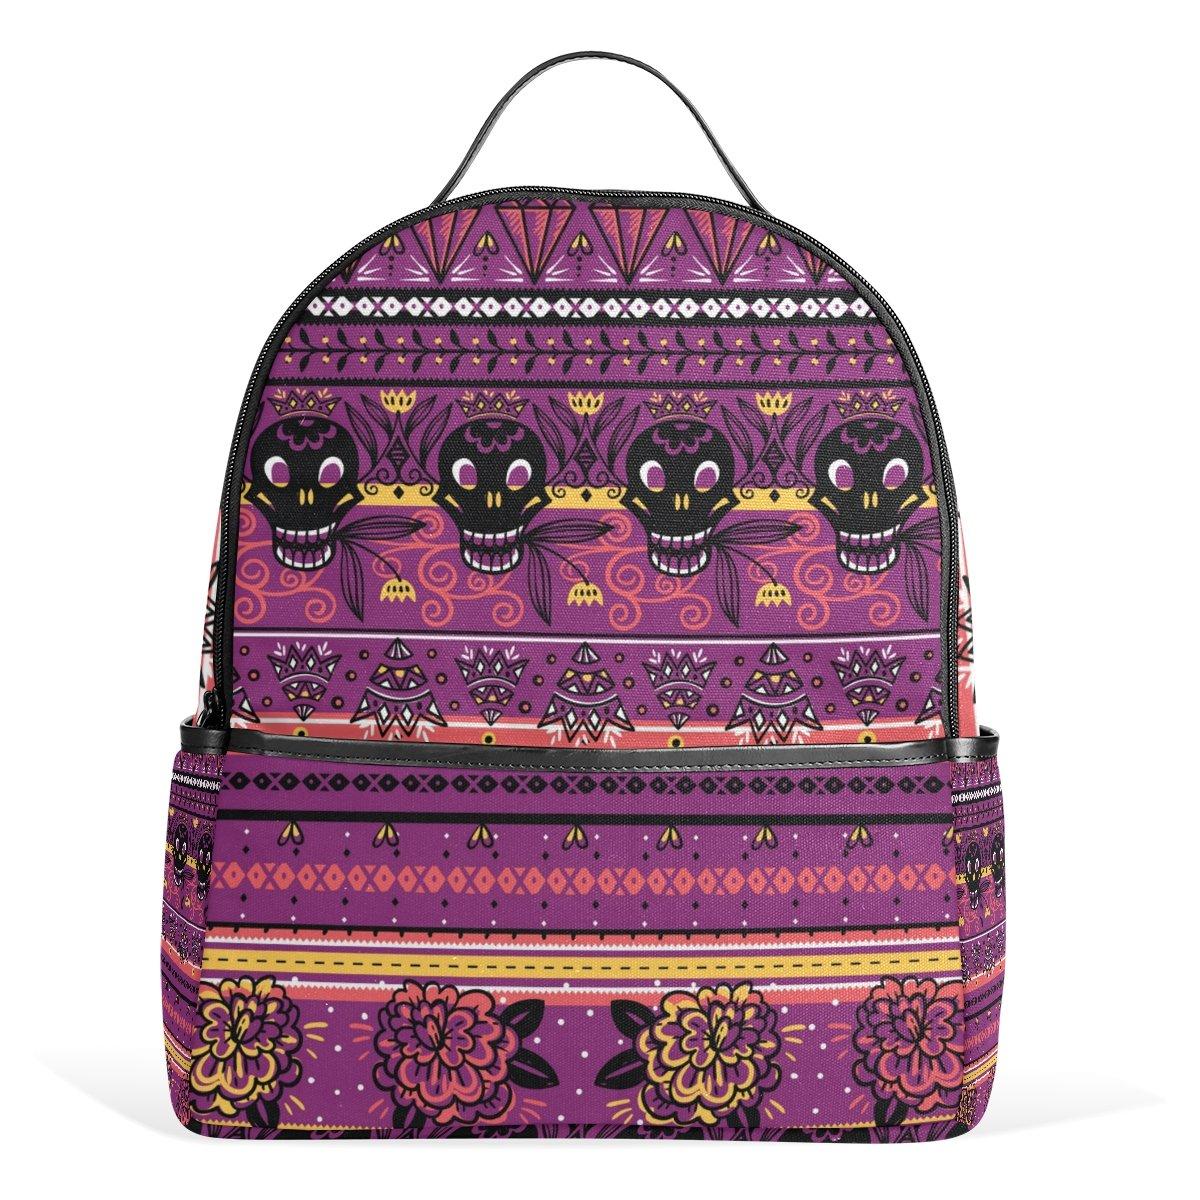 Amazon.com   Cooper girl Vintage Rose Skull Travel Backpack Camping Backpack  for Boys and Girls   Kids  Backpacks 260c891adc